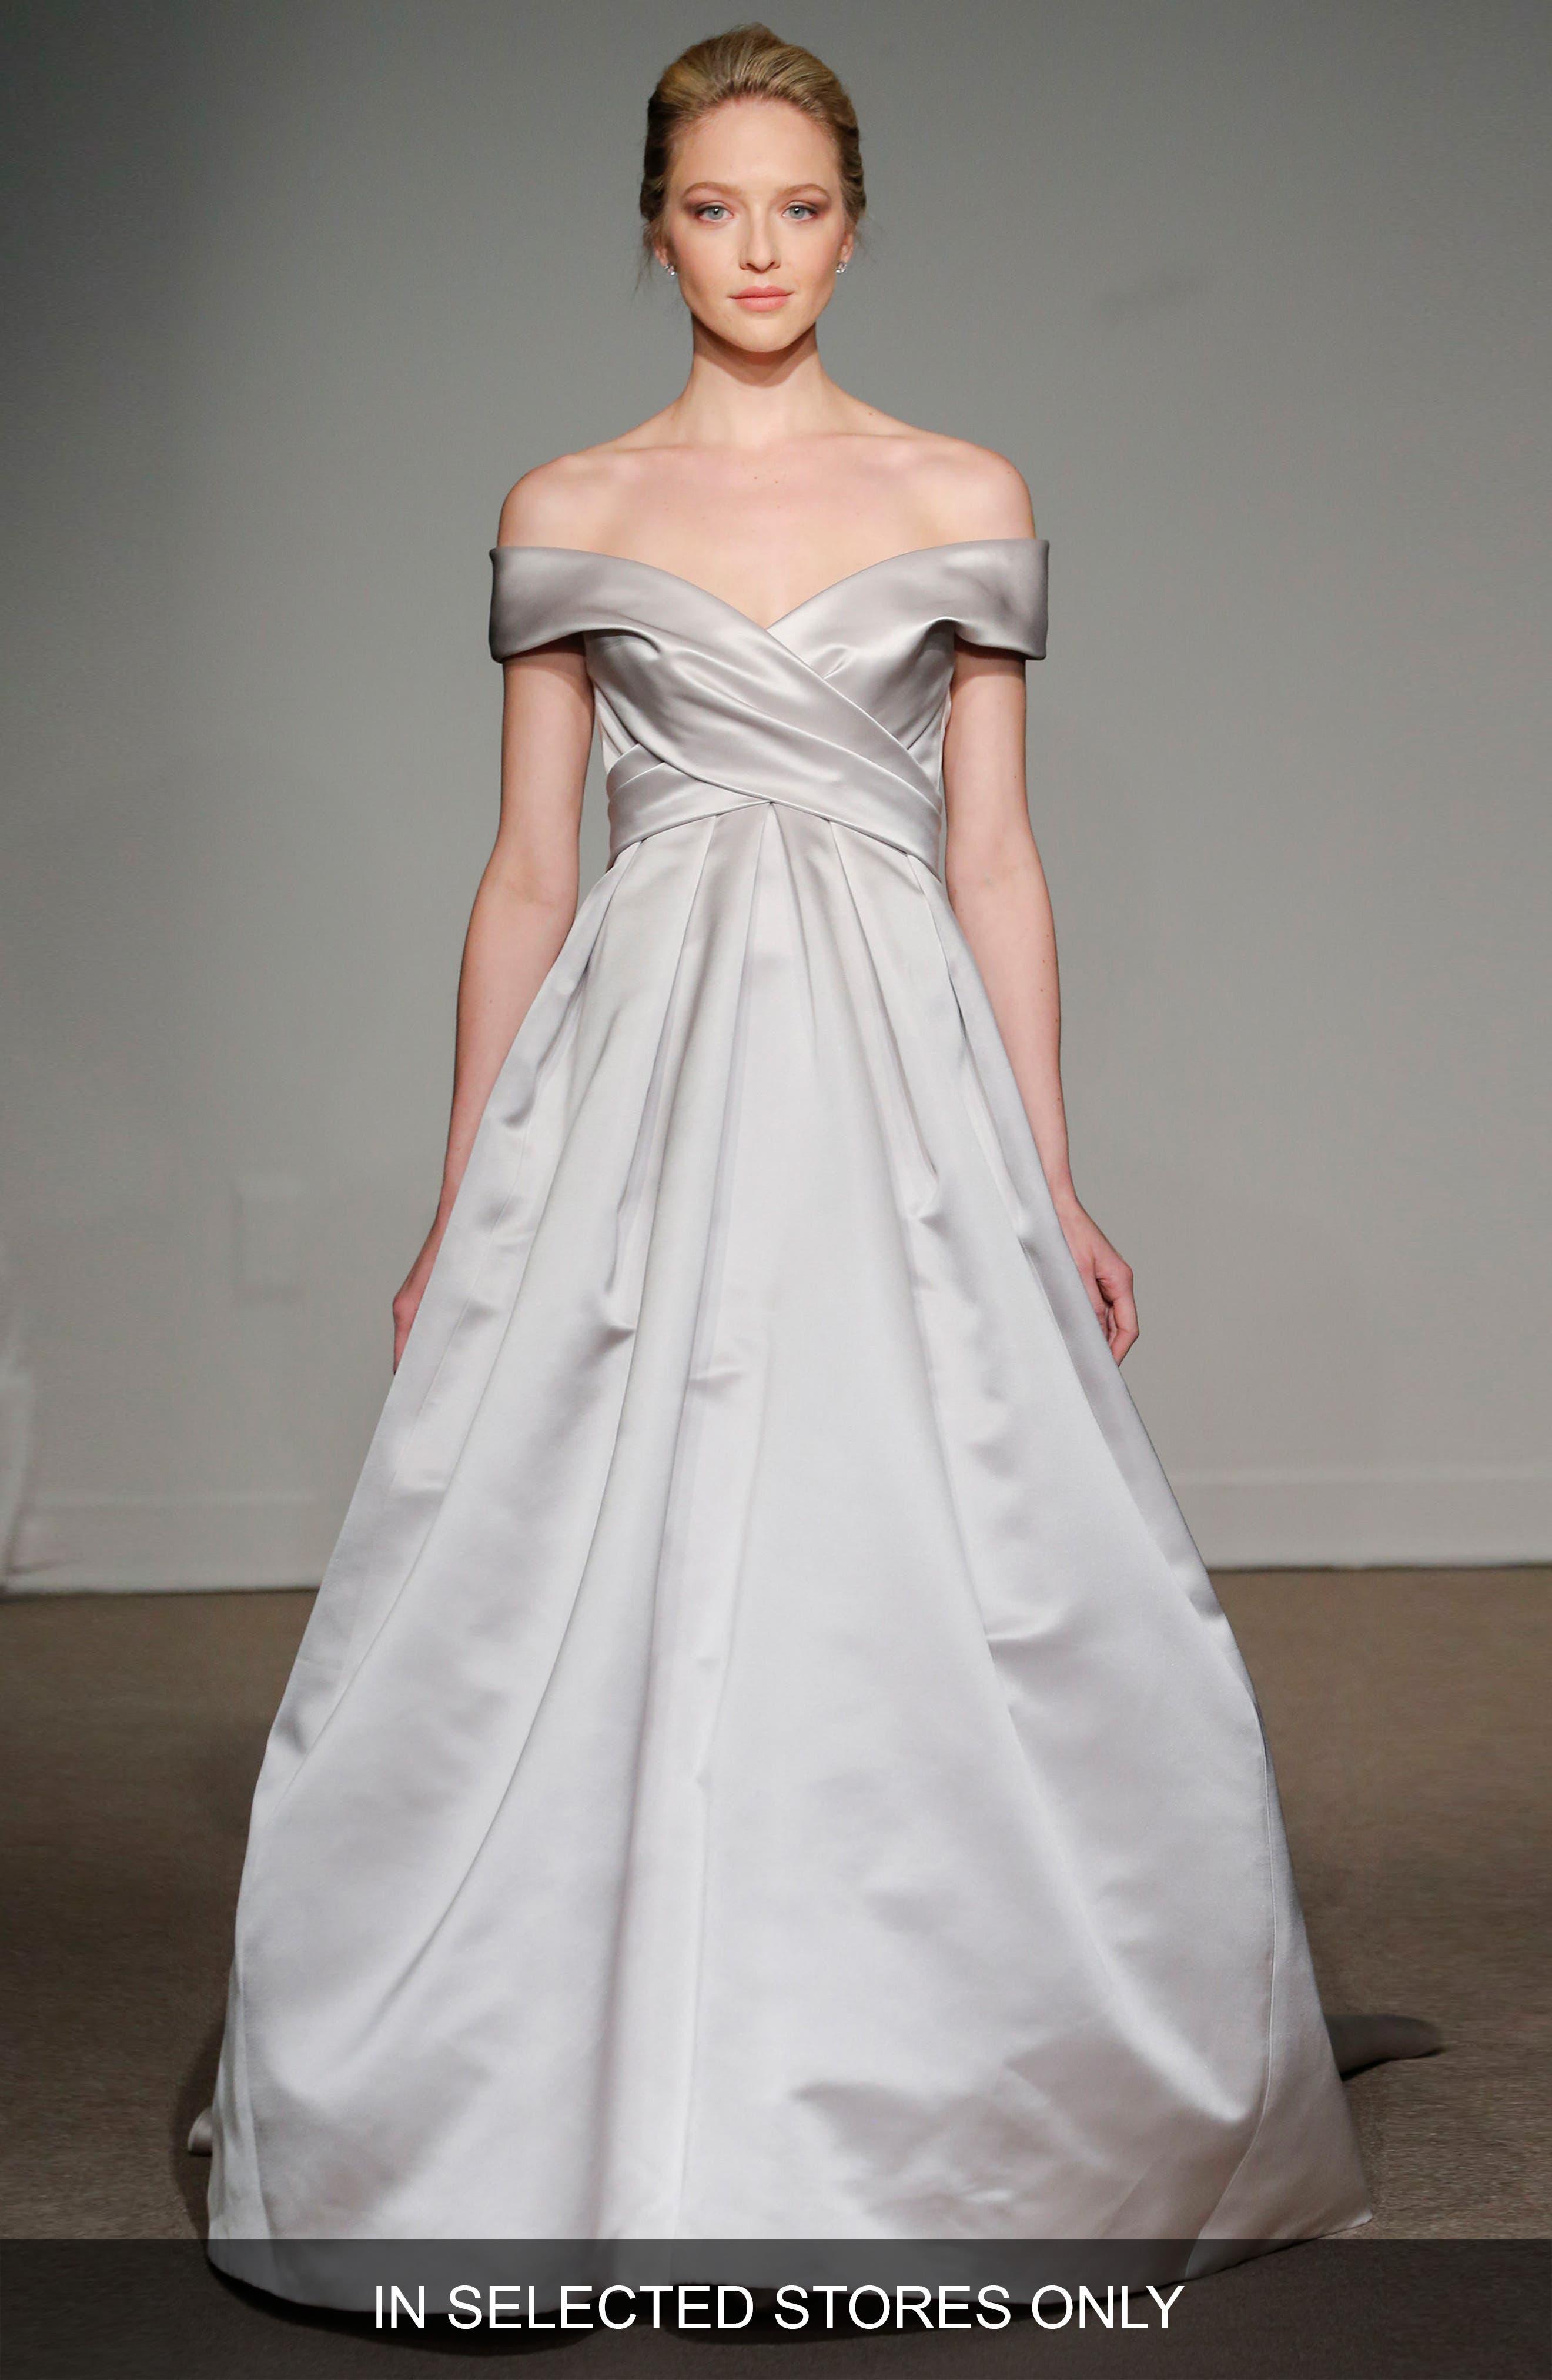 Elizabeth Off the Shoulder Silk Gown,                             Main thumbnail 1, color,                             SOFT WHITE